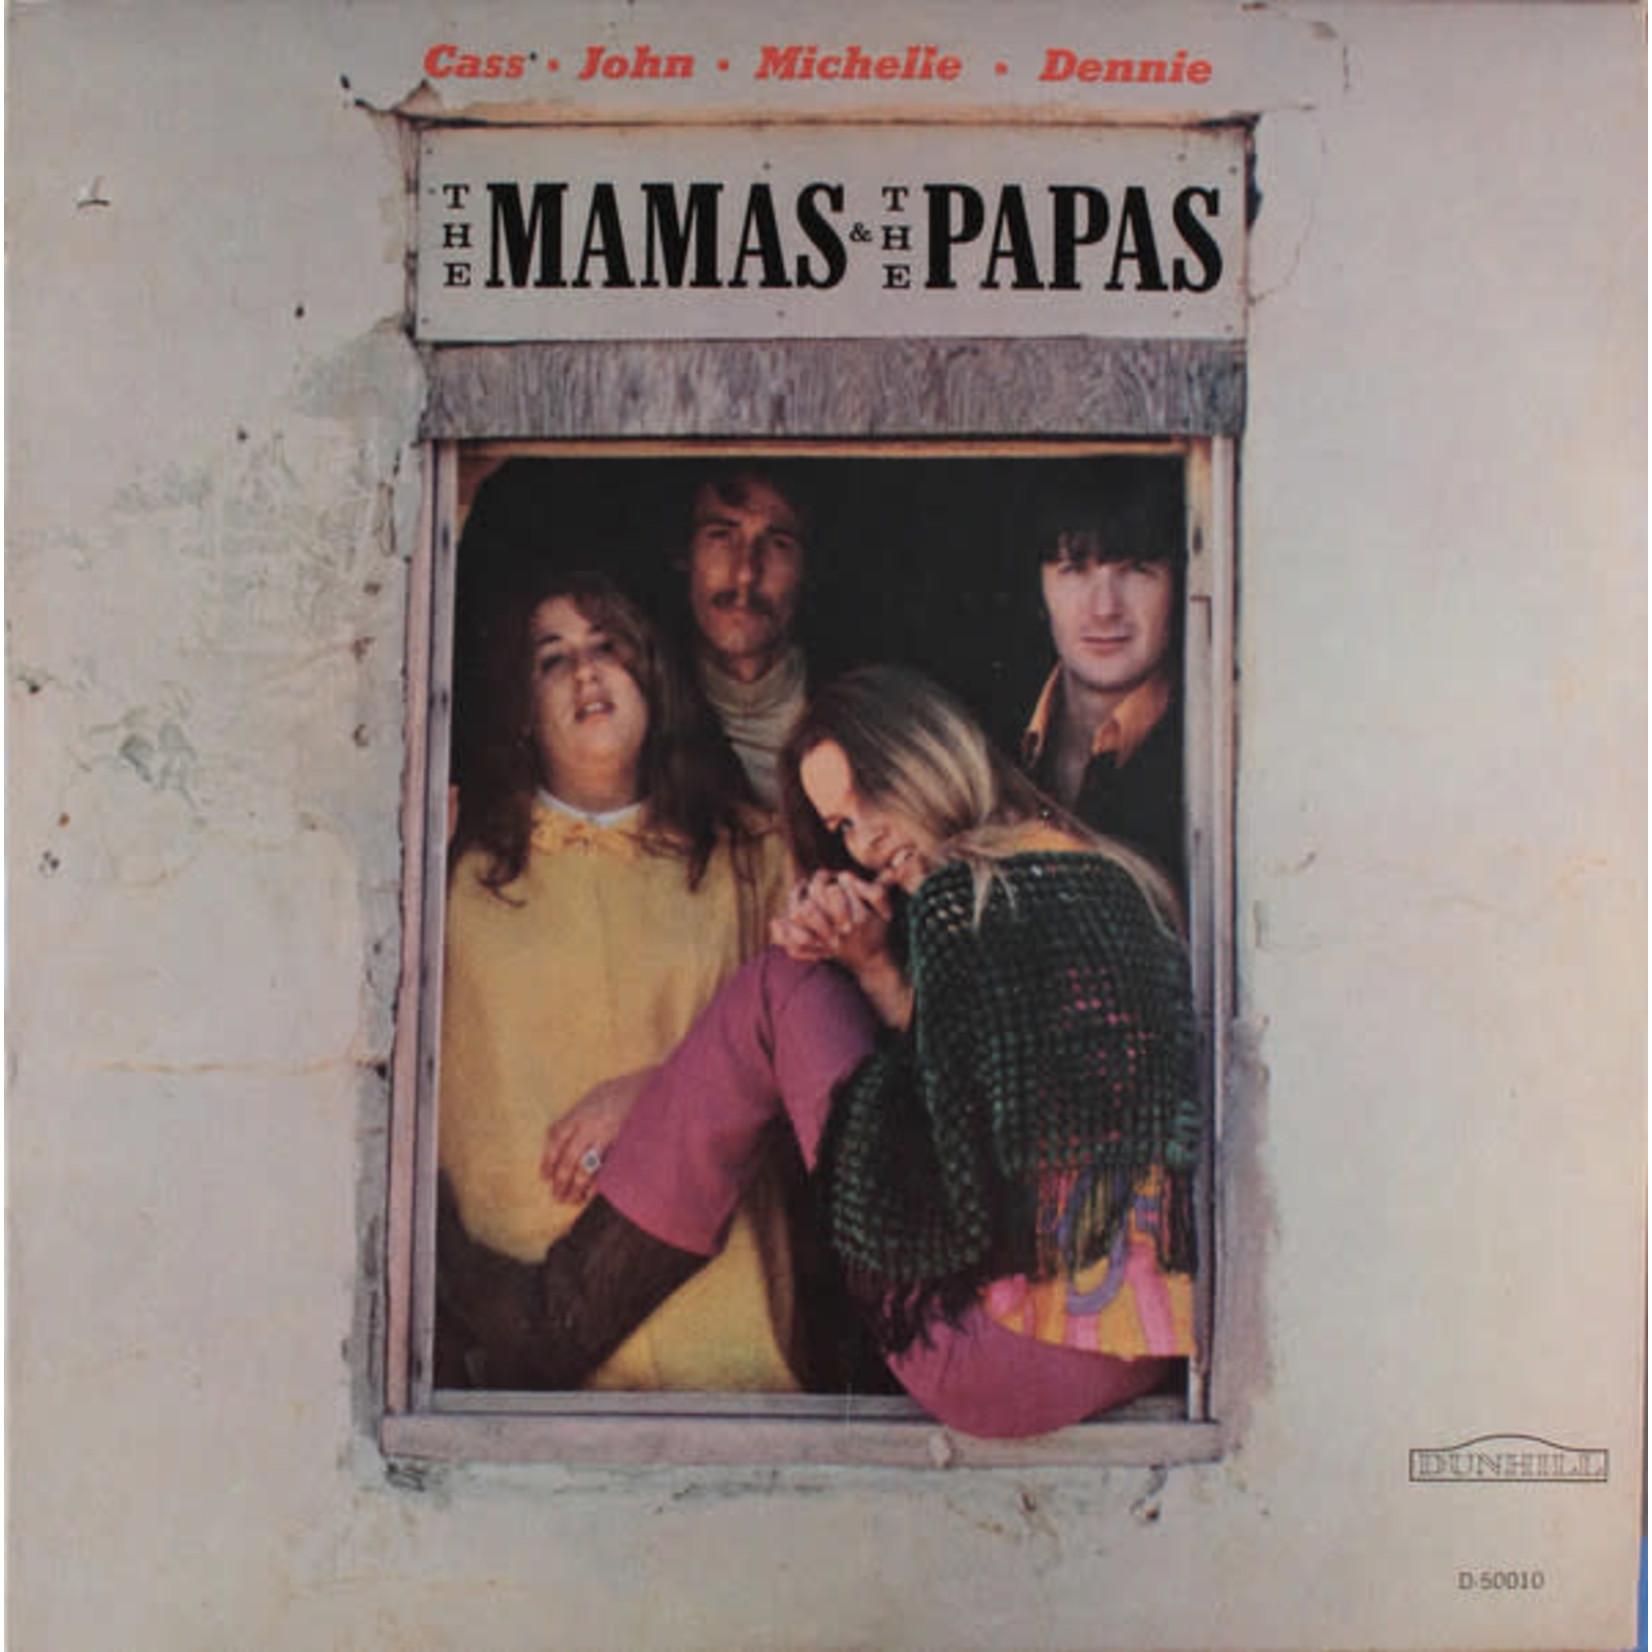 [Vintage] Mamas & Papas: self-titled